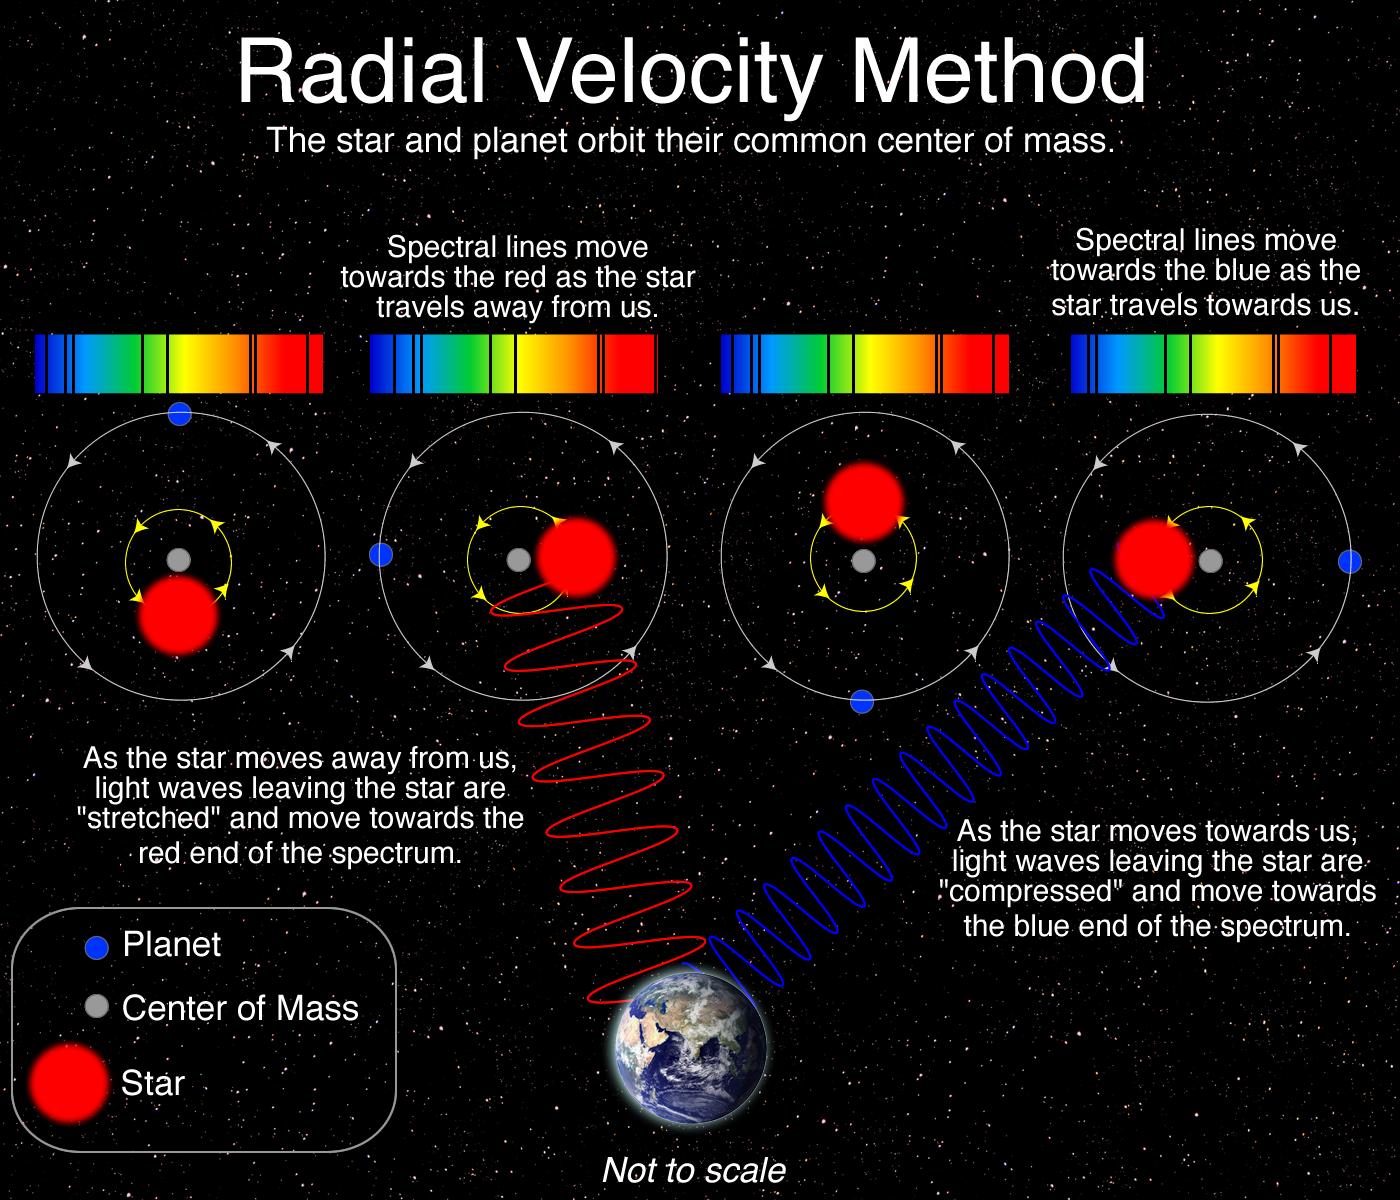 Source: https://lco.global/spacebook/radial-velocity-method/